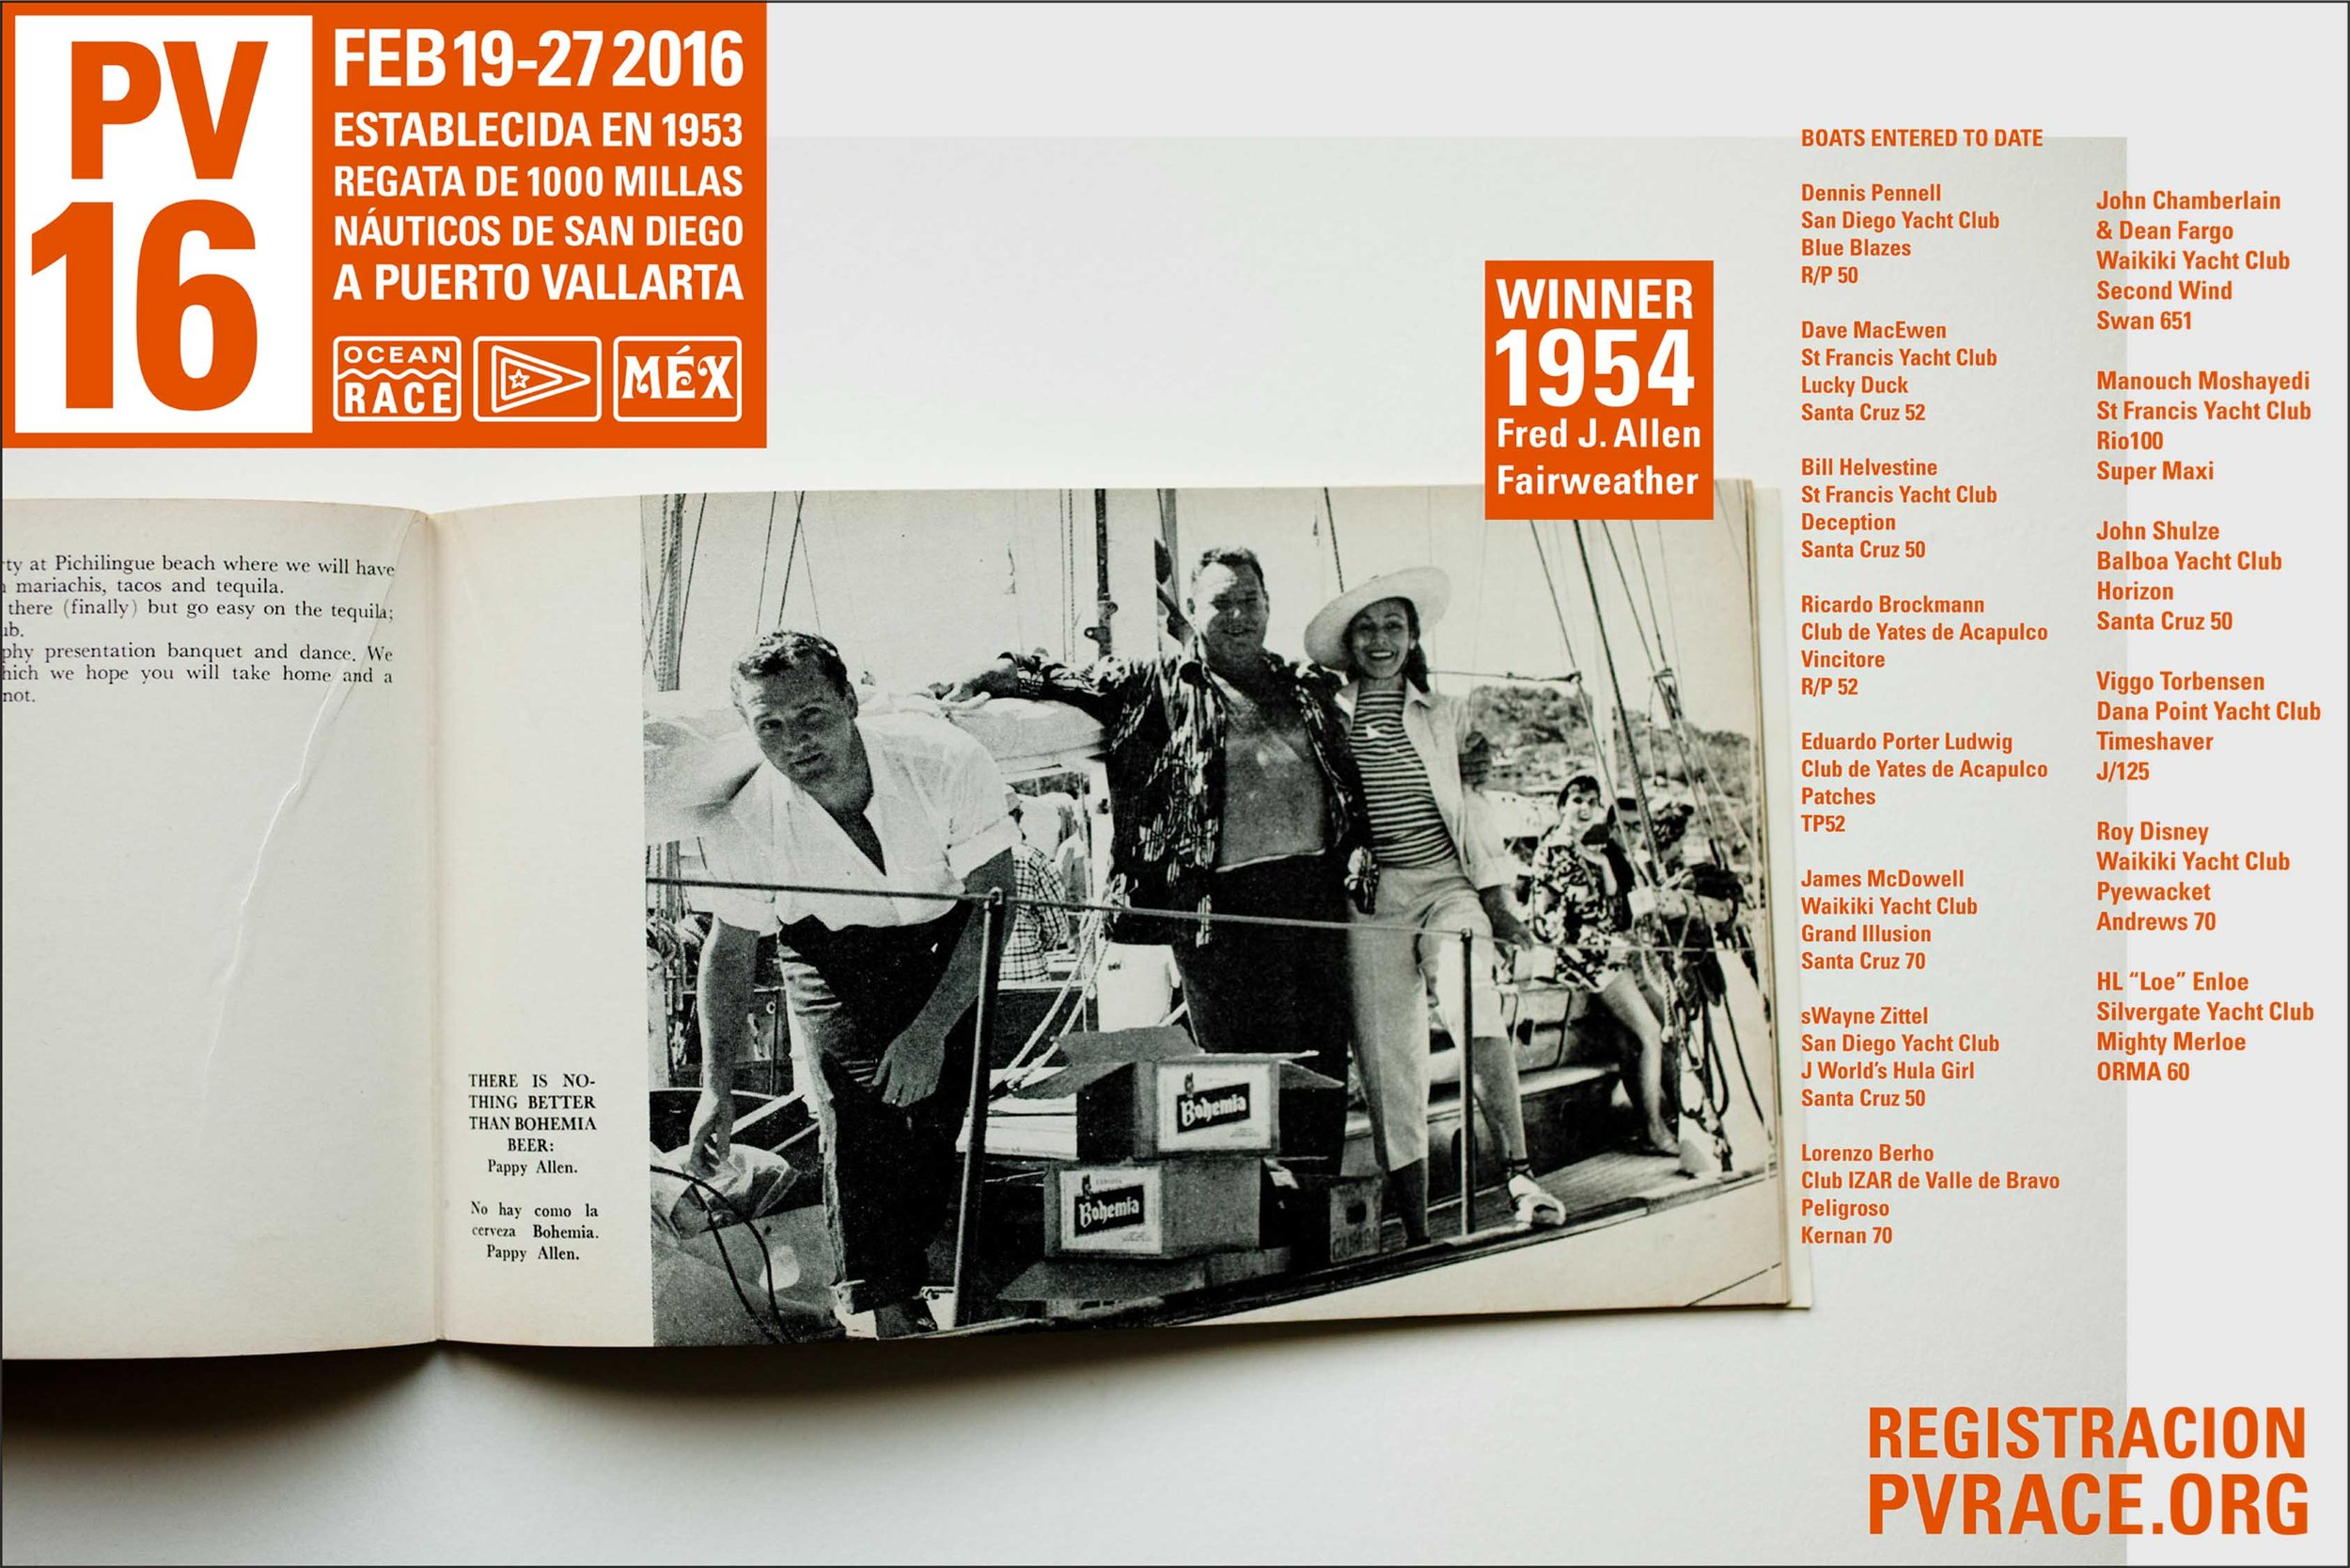 pv2016_portfolio_2016_poster_ver01_rgc.jpg